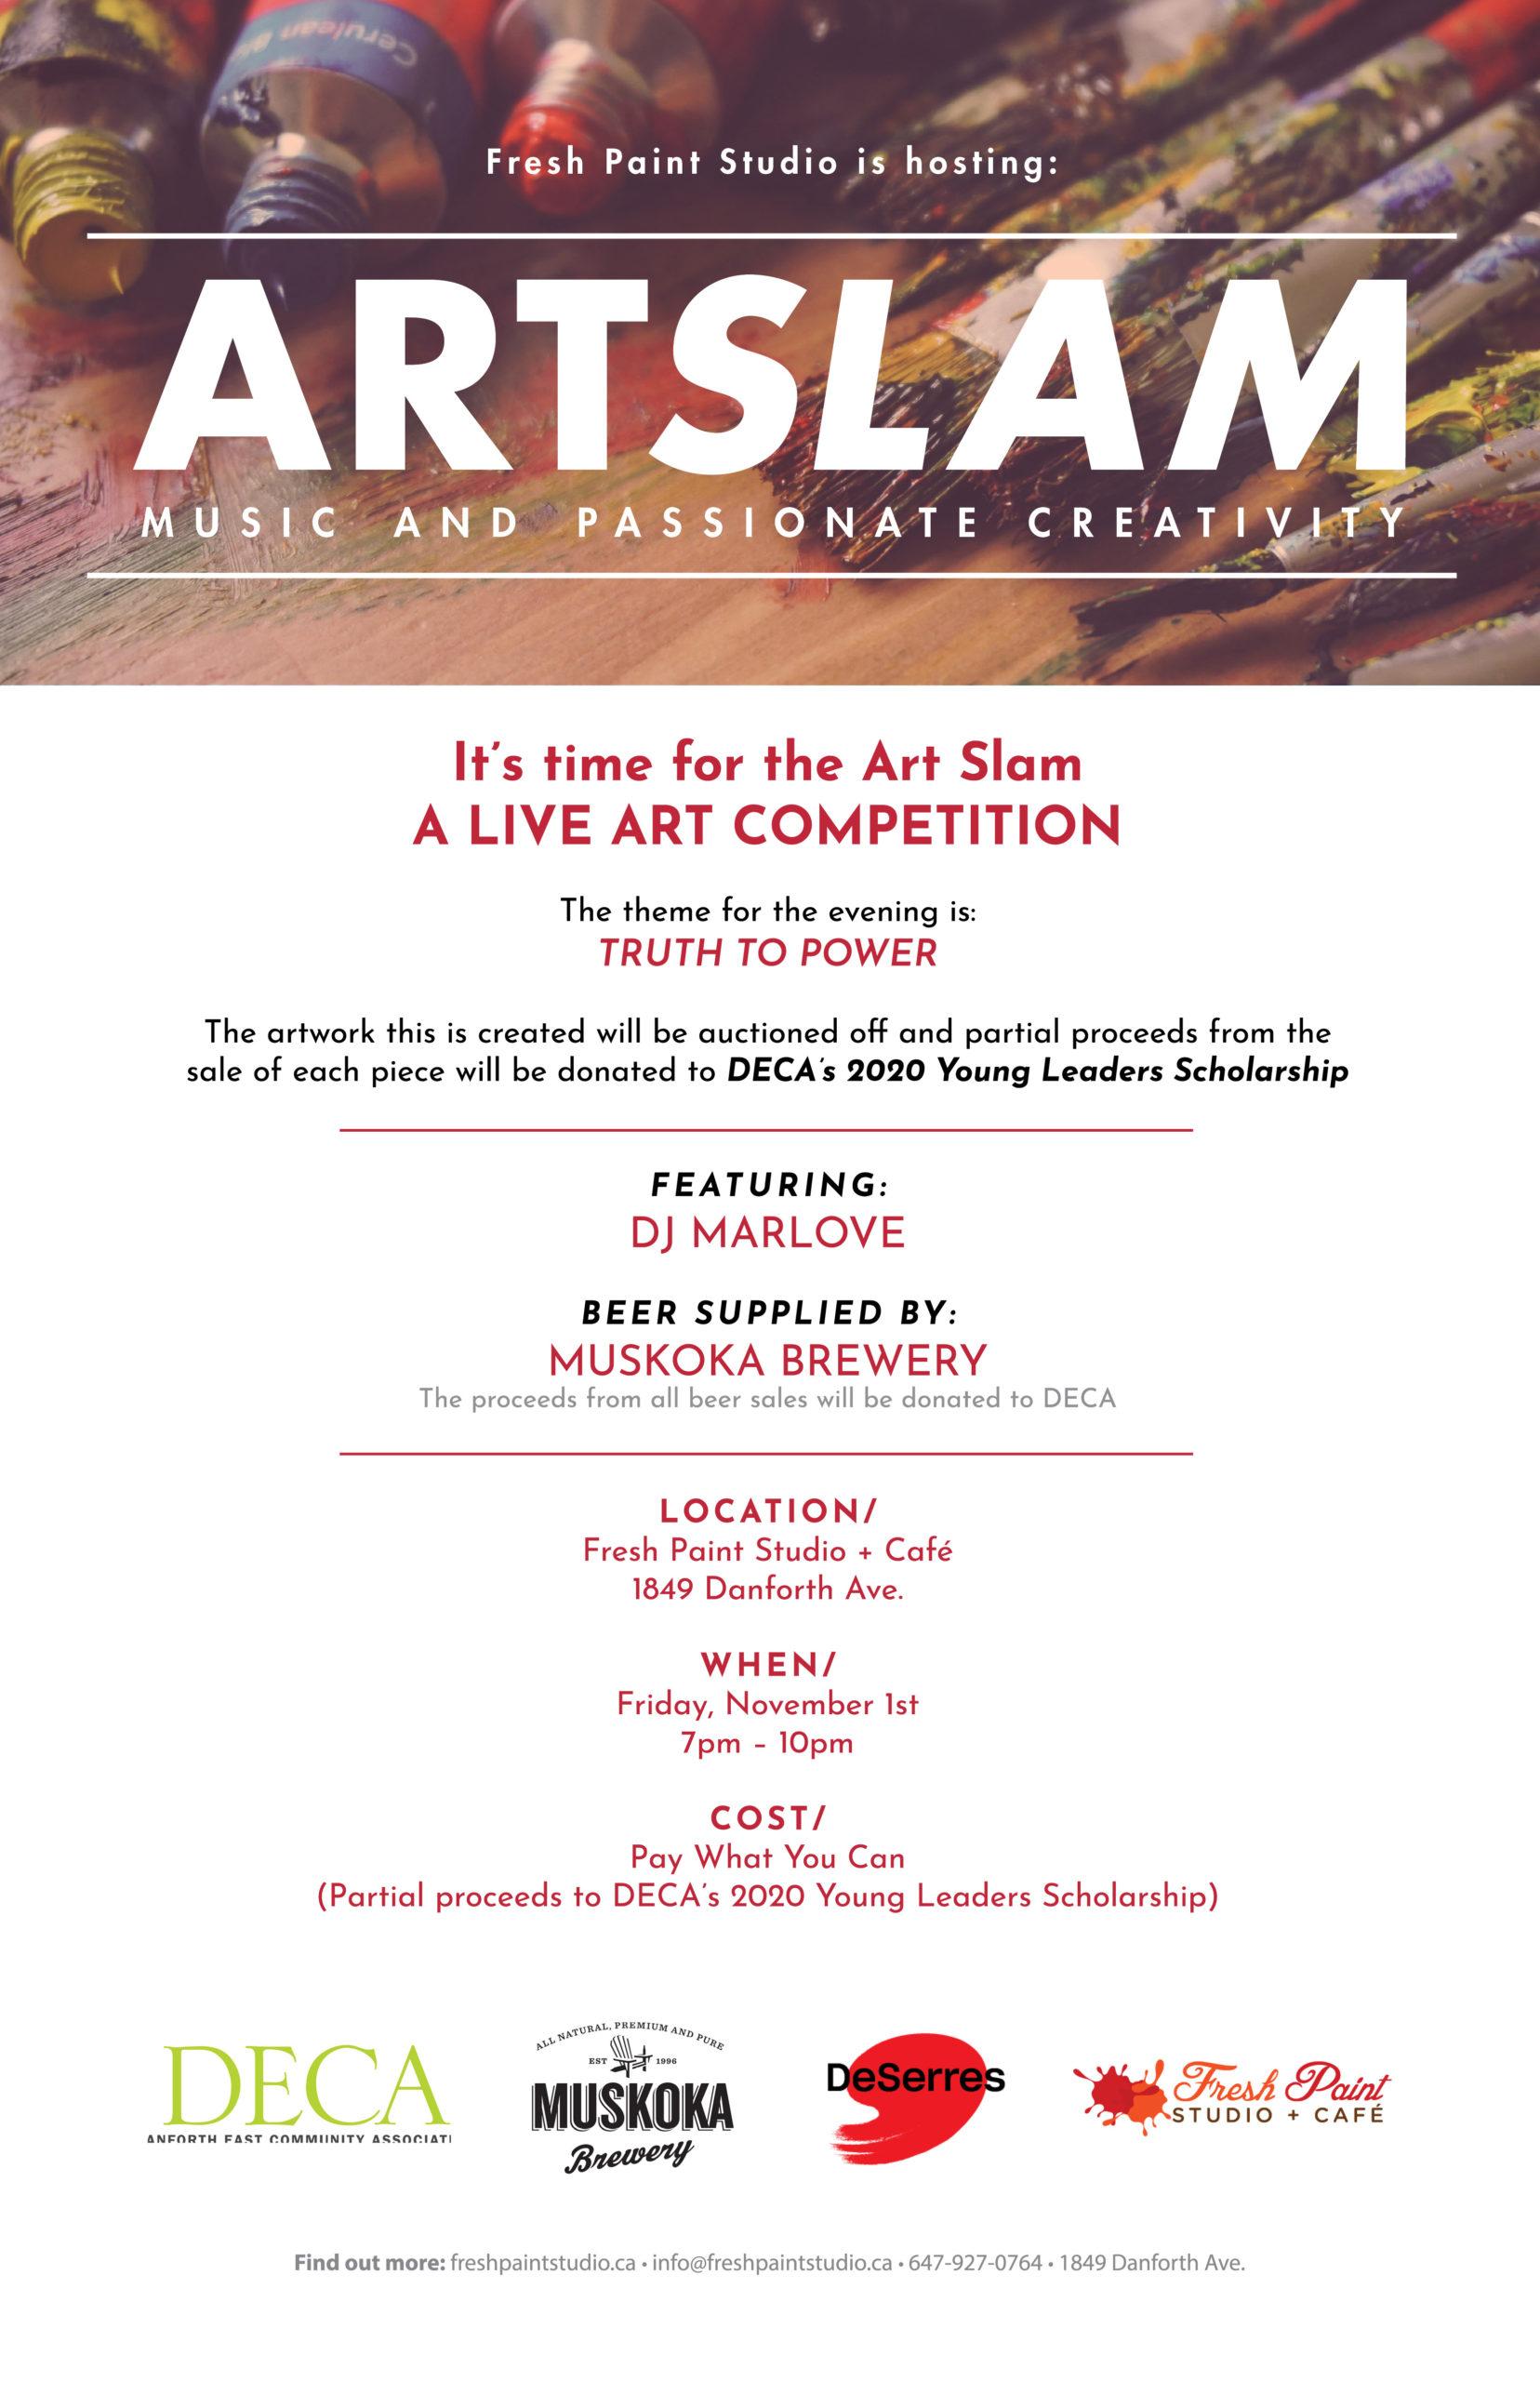 Art Slam - Live Art Competition